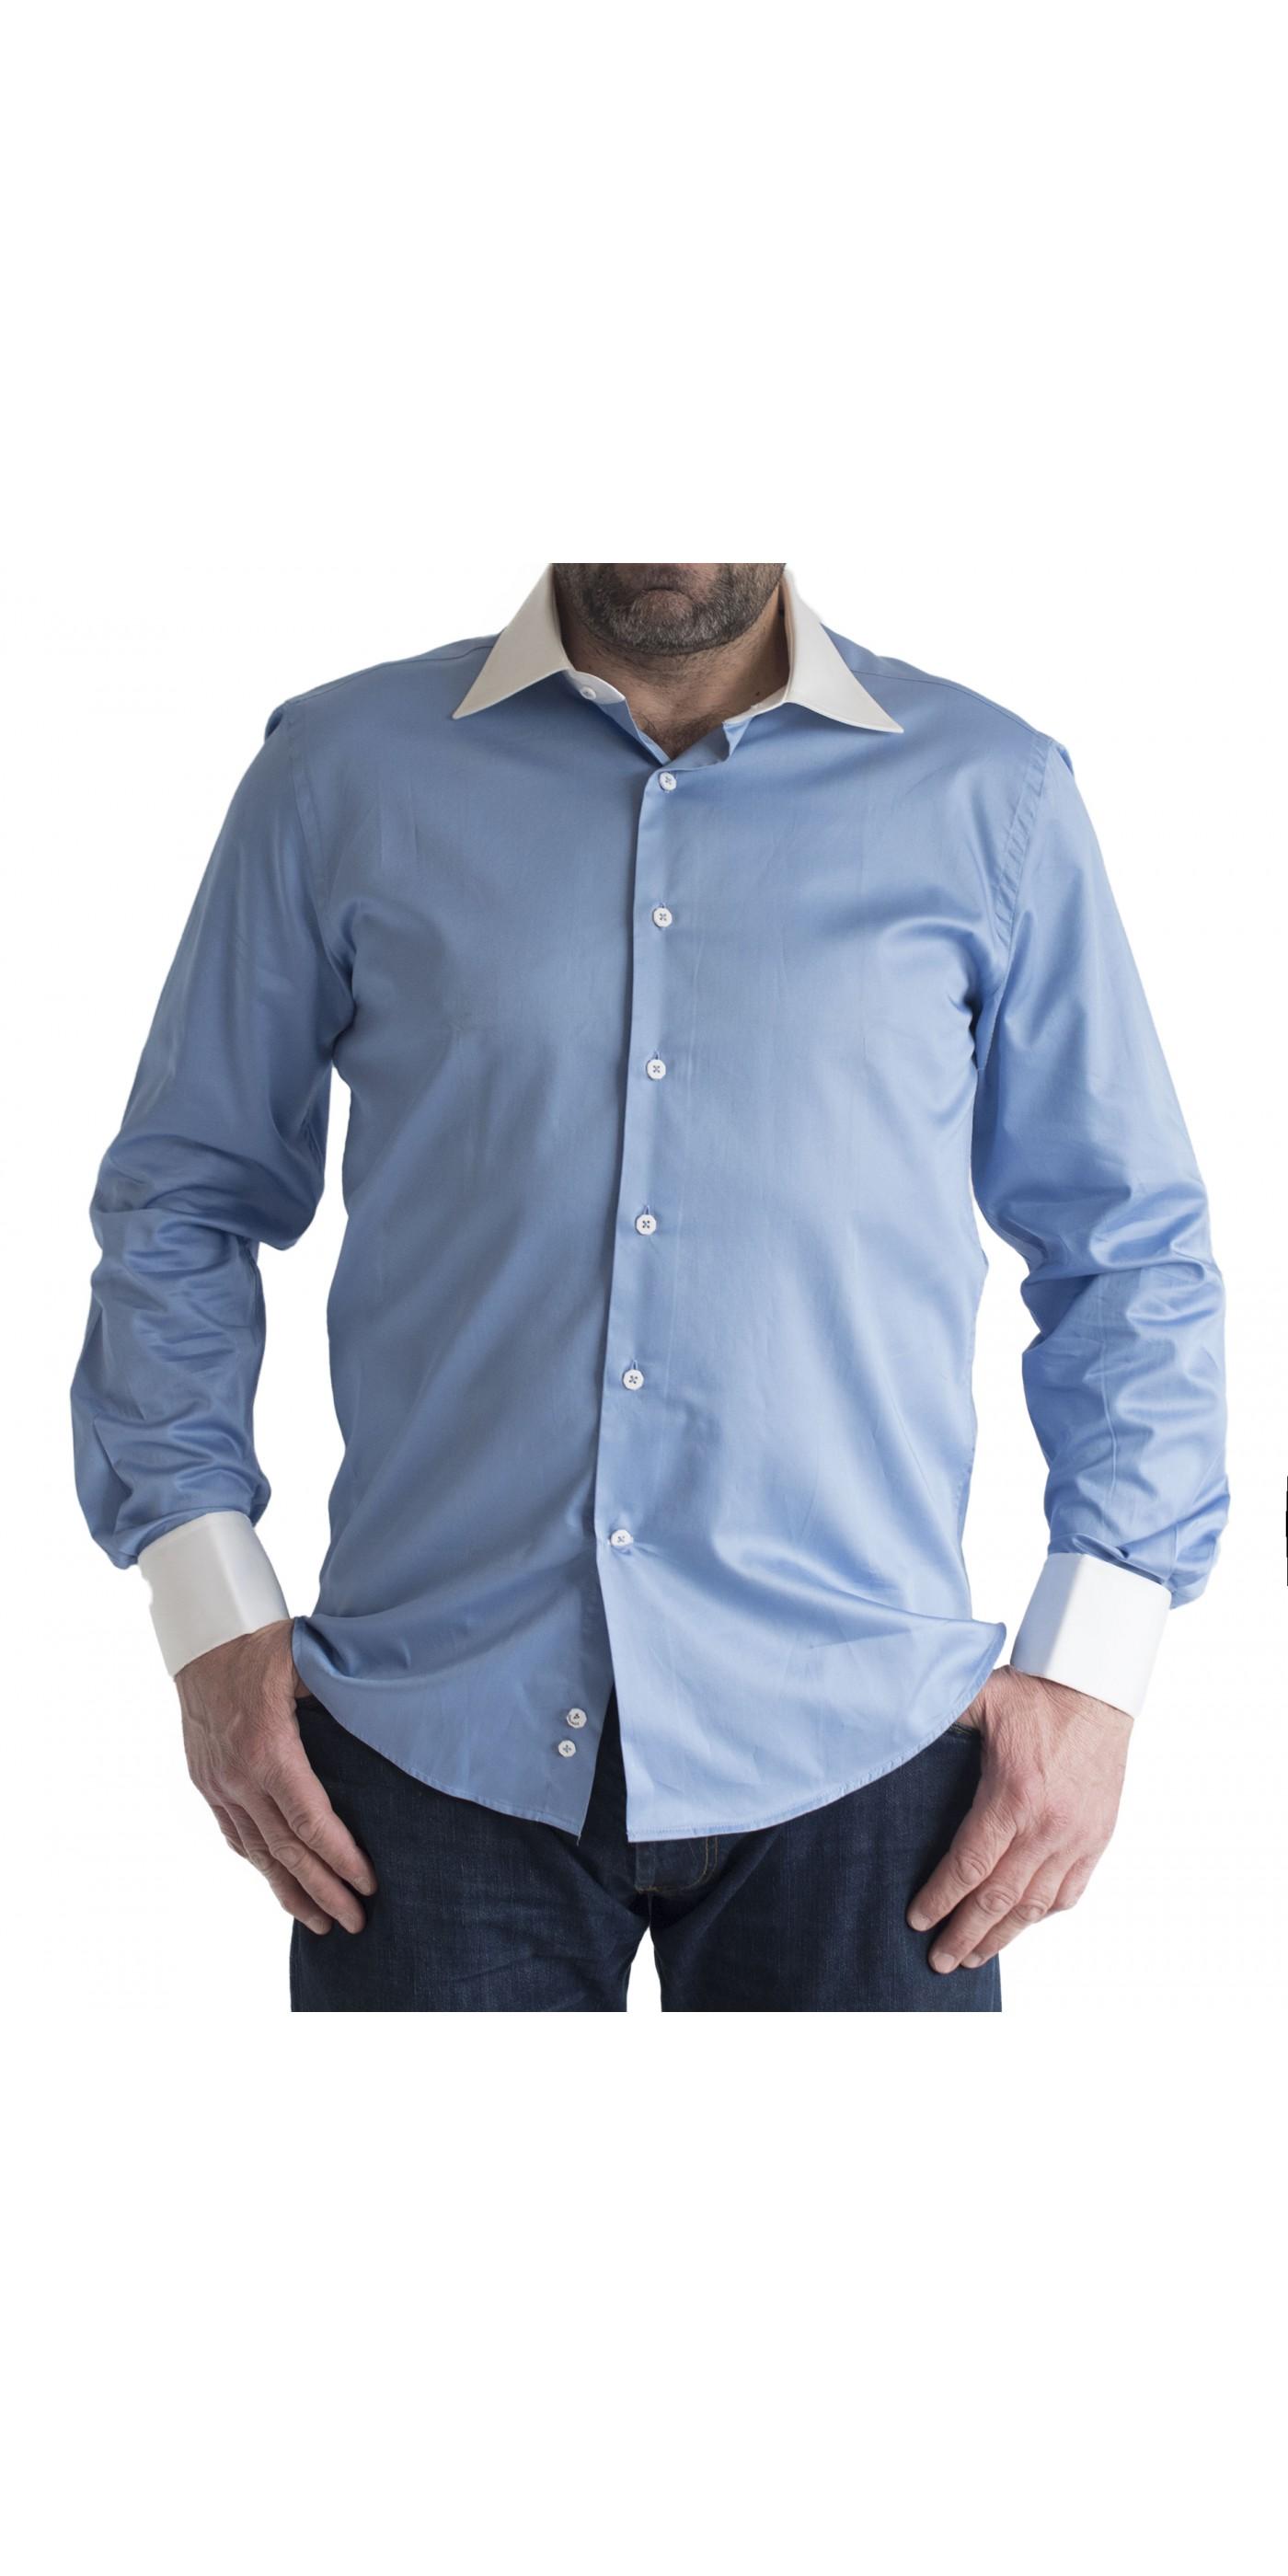 70d5cdeb98bb Ανδρικό Πουκάμισο slim fit μονοχρωμο μπλε-ραφ με λευκο γιακα και μανσετα. Loading  zoom